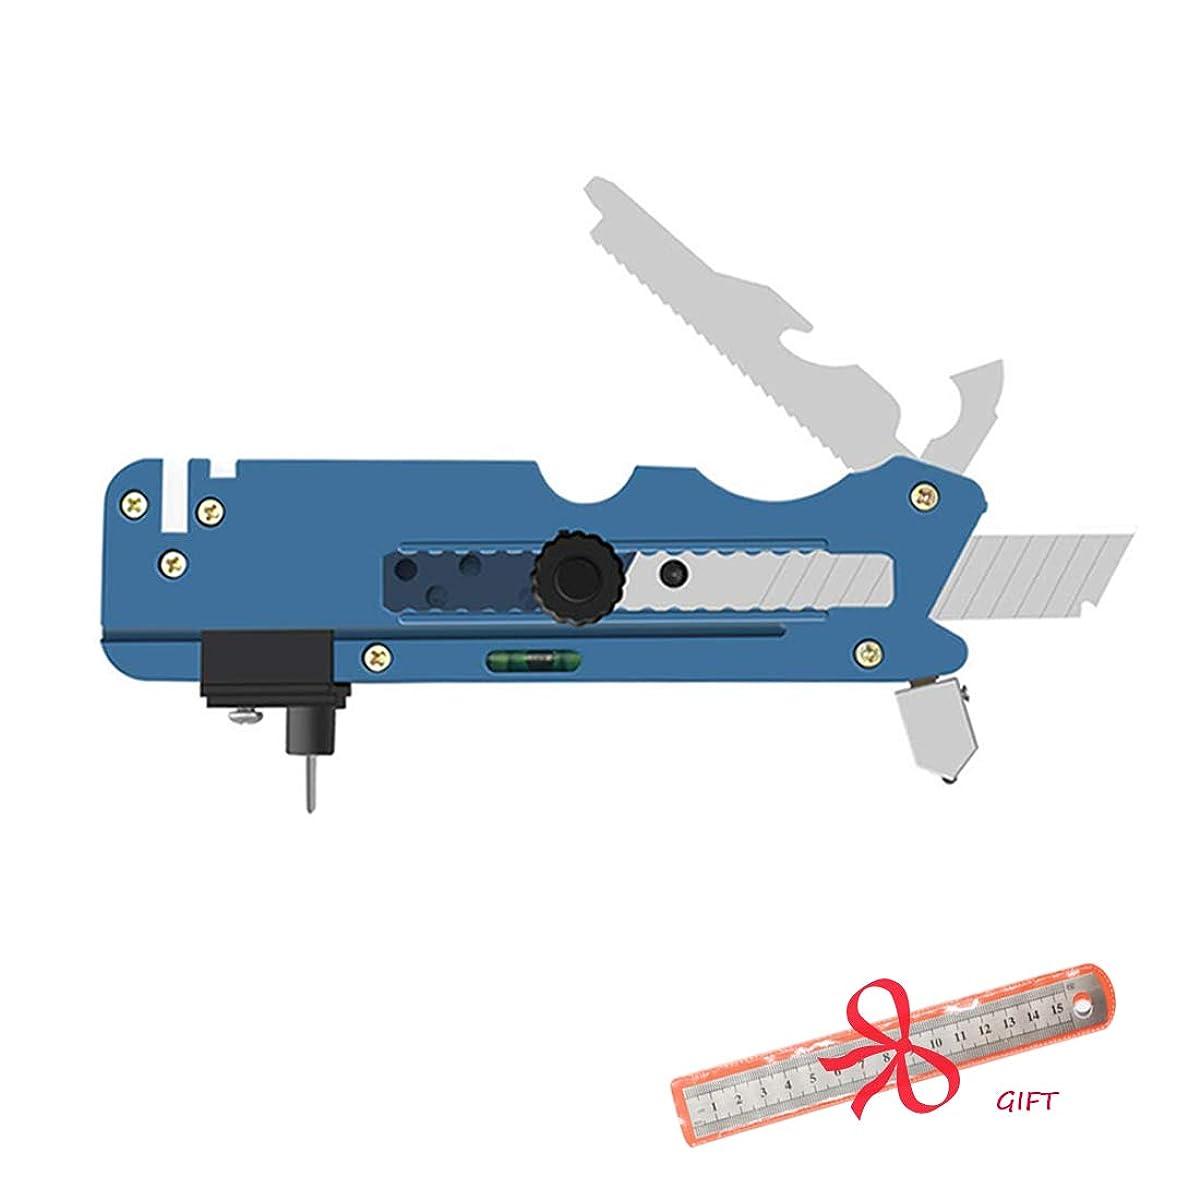 PASNOWFU 2019 Professional Multifunction Glass Cutter Six Wheel Metal Cutting Tool with Measuring Ruler